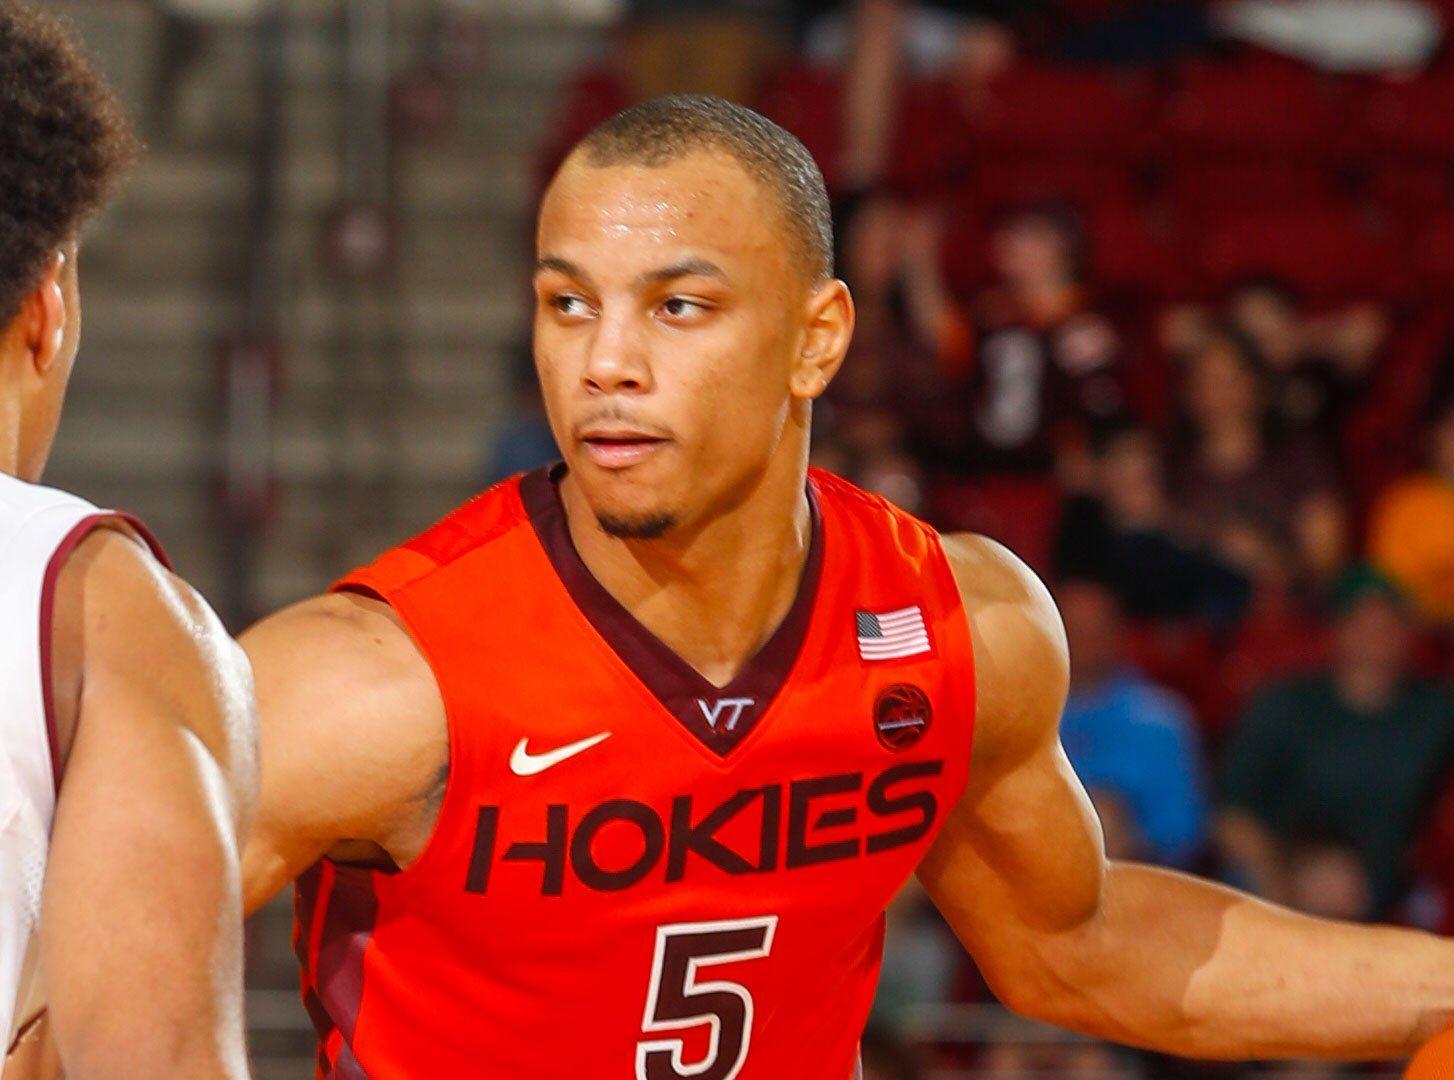 Virginia Tech Basketball Hokies Team Preview and Season